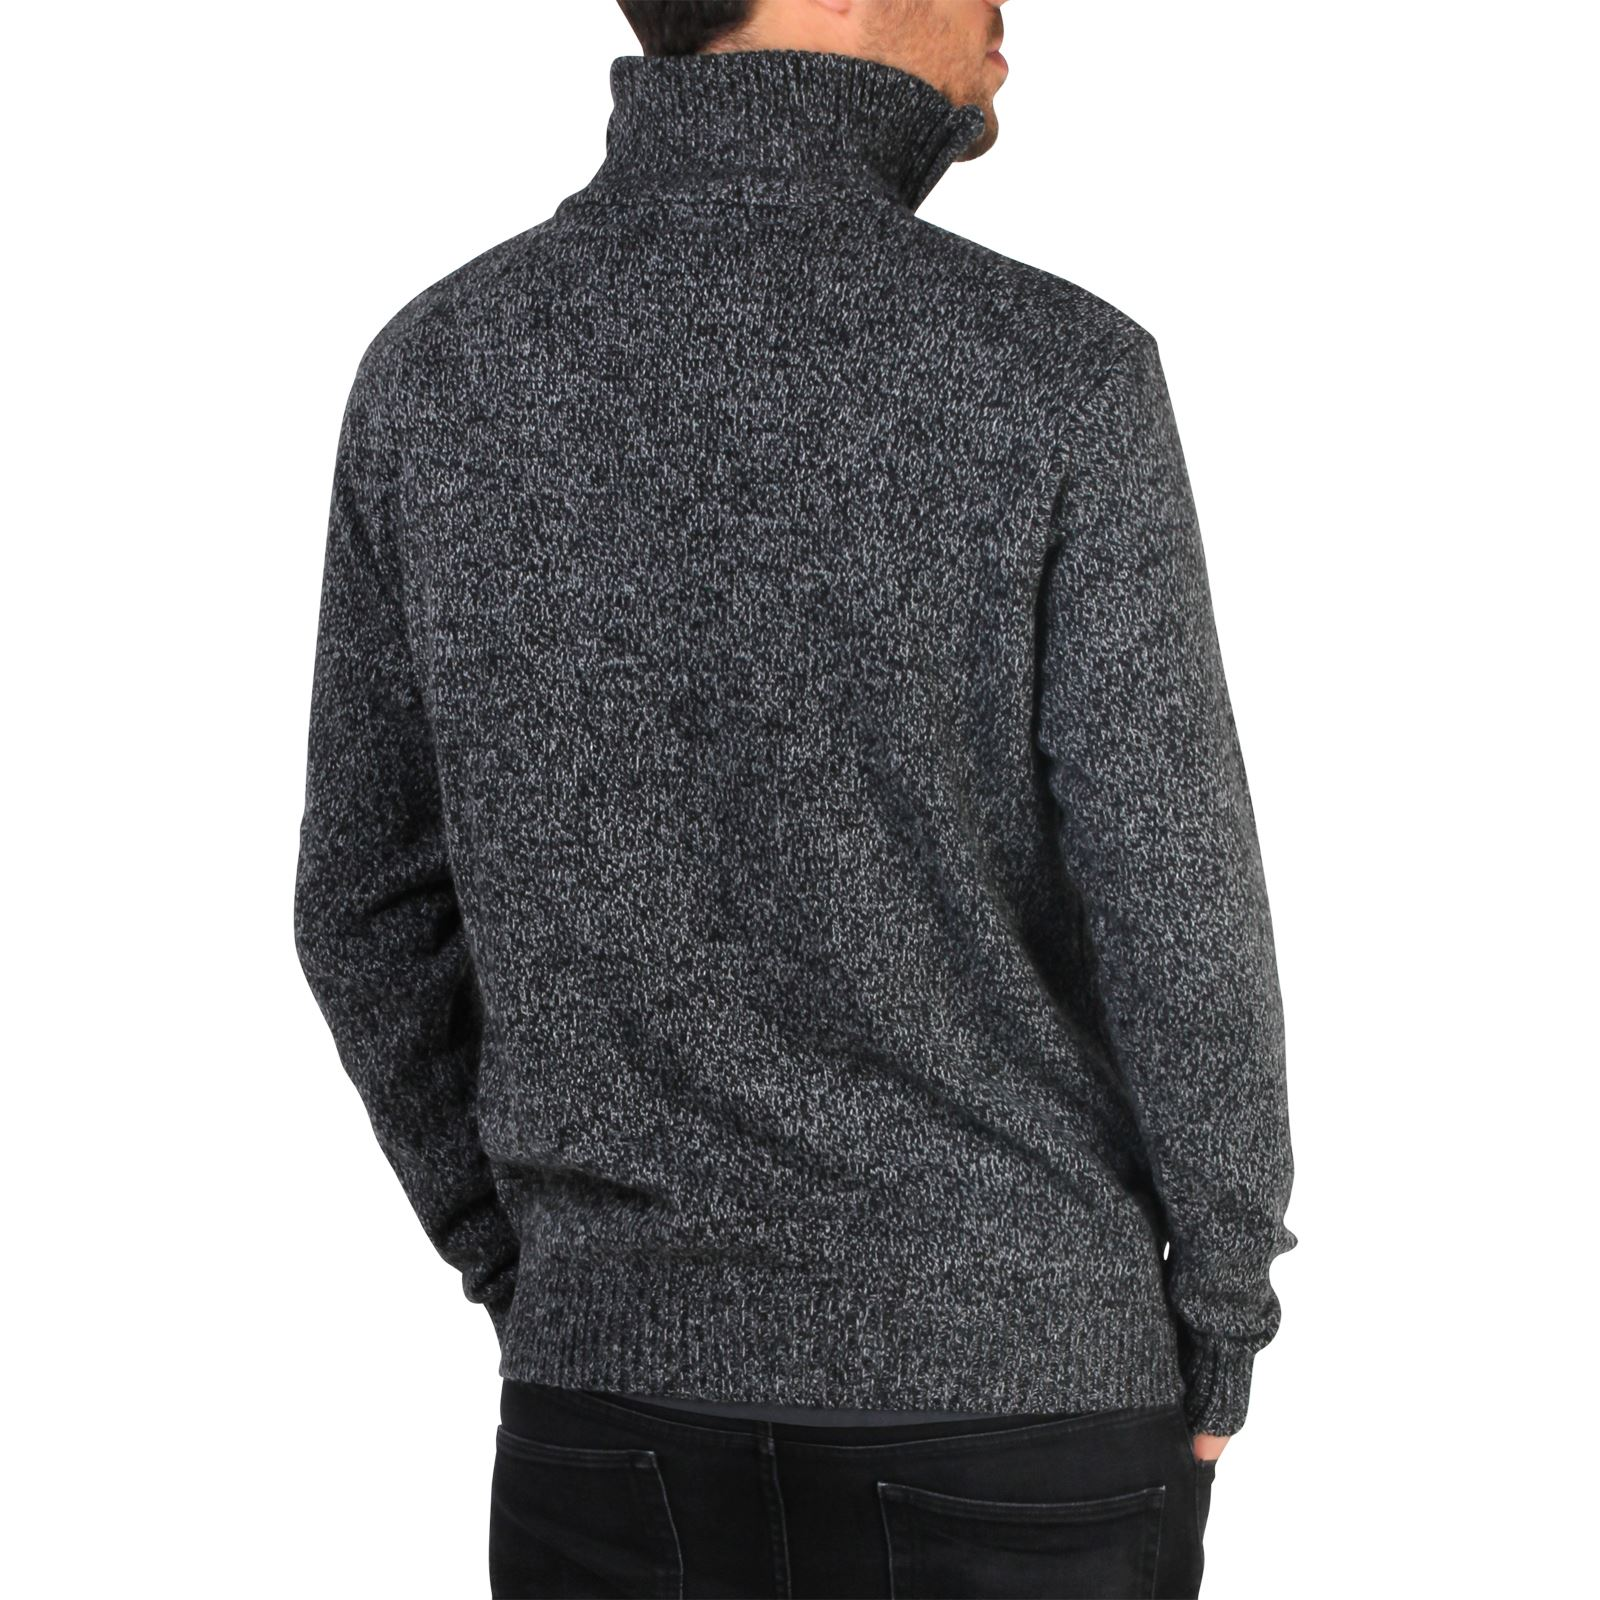 Mens-Soft-Wool-Knit-Half-Zip-Funnel-Neck-Jumper-Sweater-Top-Grandad-Pullover-Top thumbnail 3